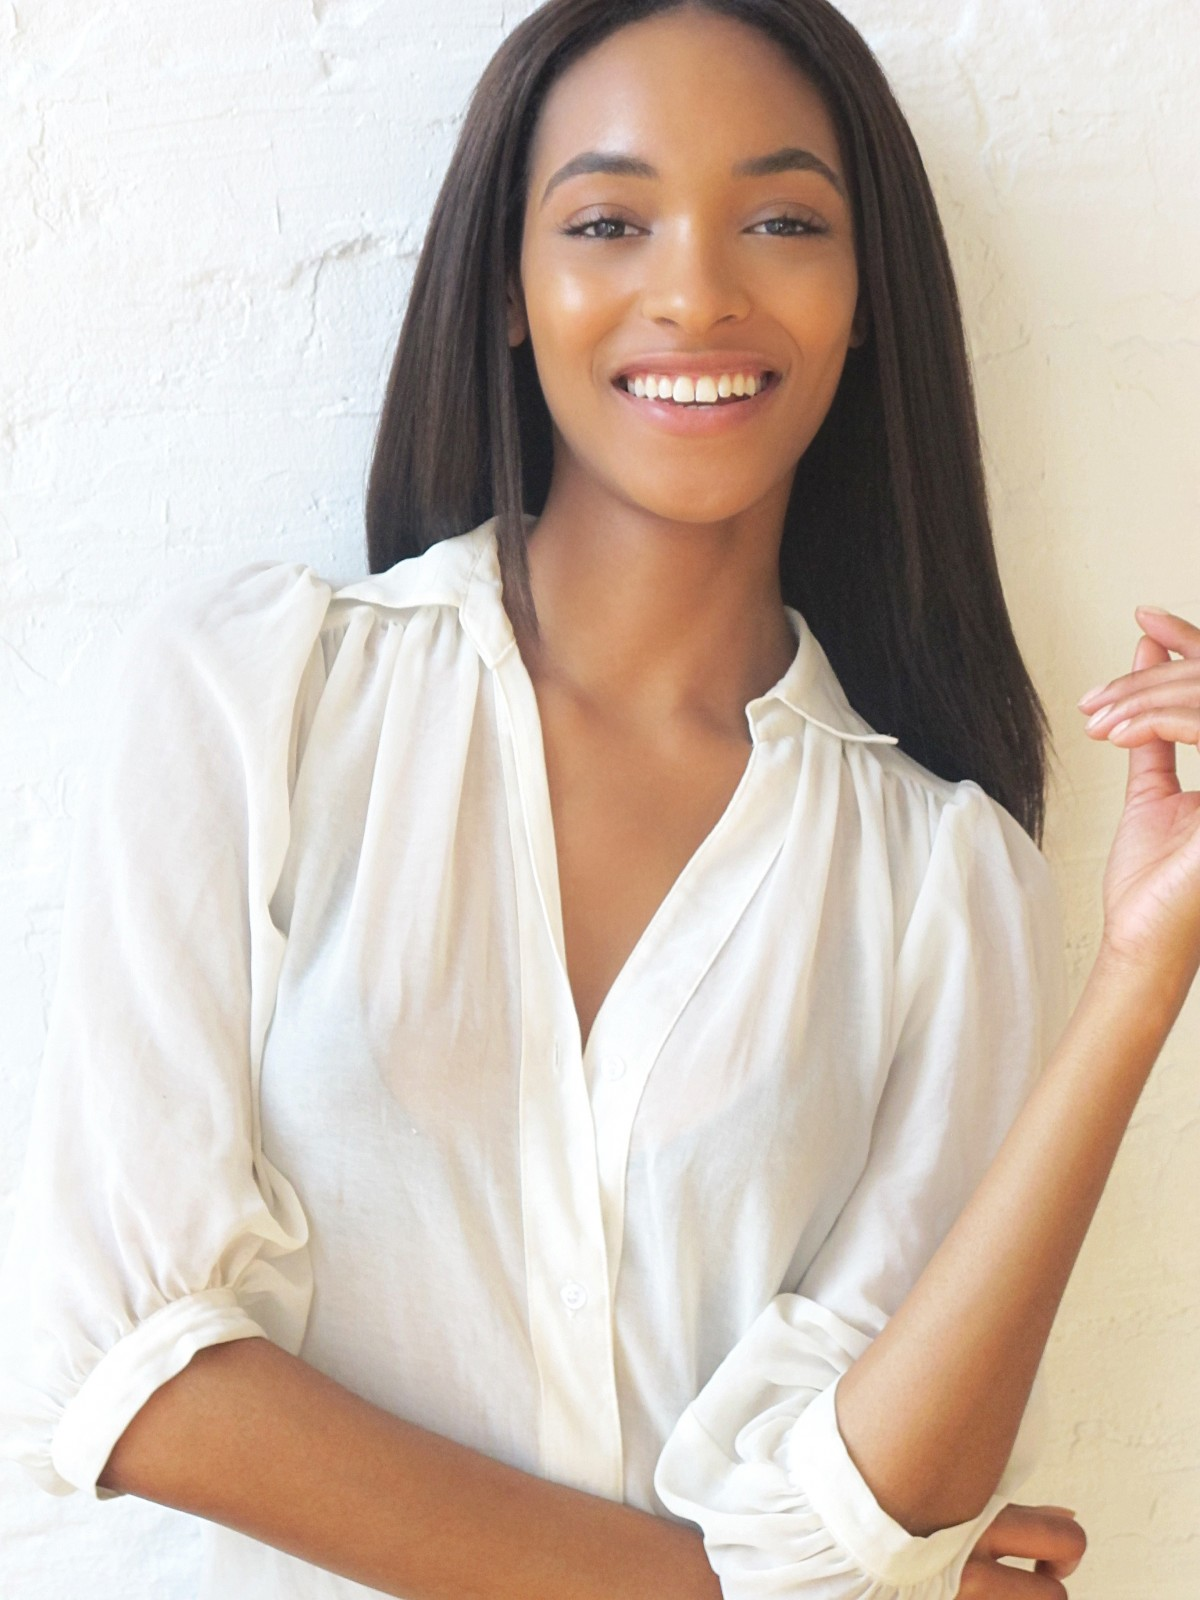 Maybelline's New Spokesperson: Jourdan Dunn